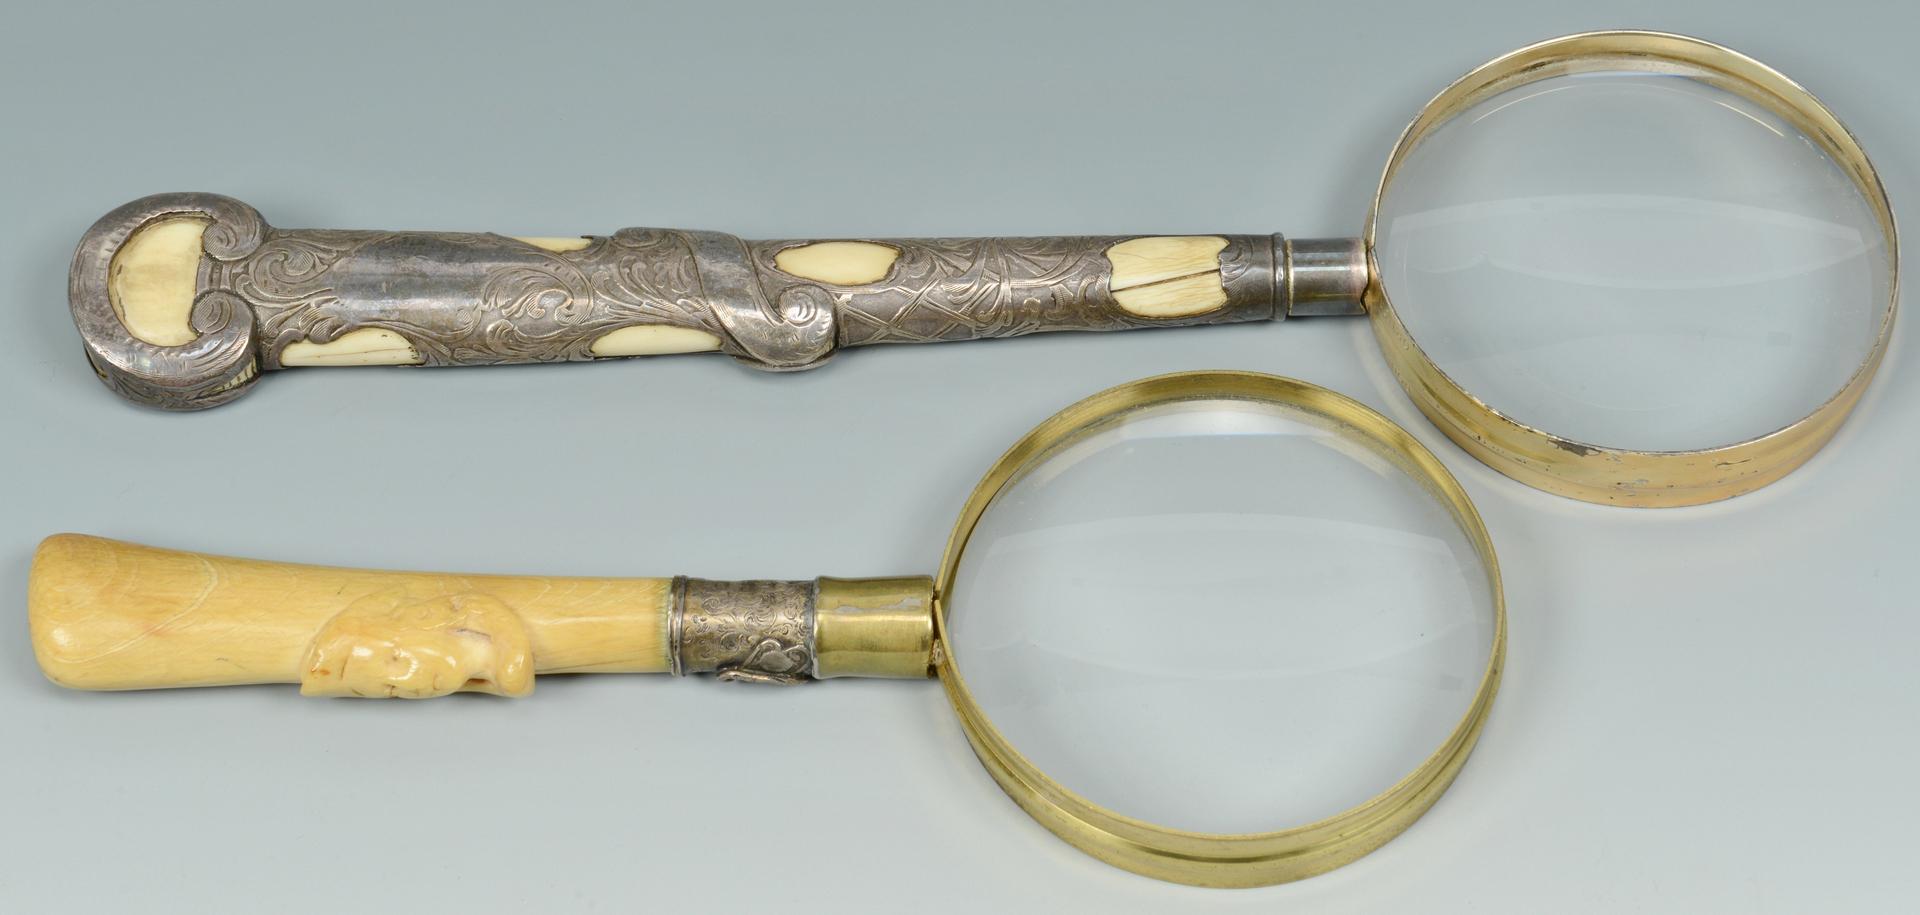 Lot 3088137: 4 Antique Ivory Items: magnifiers, tusk bracelet,